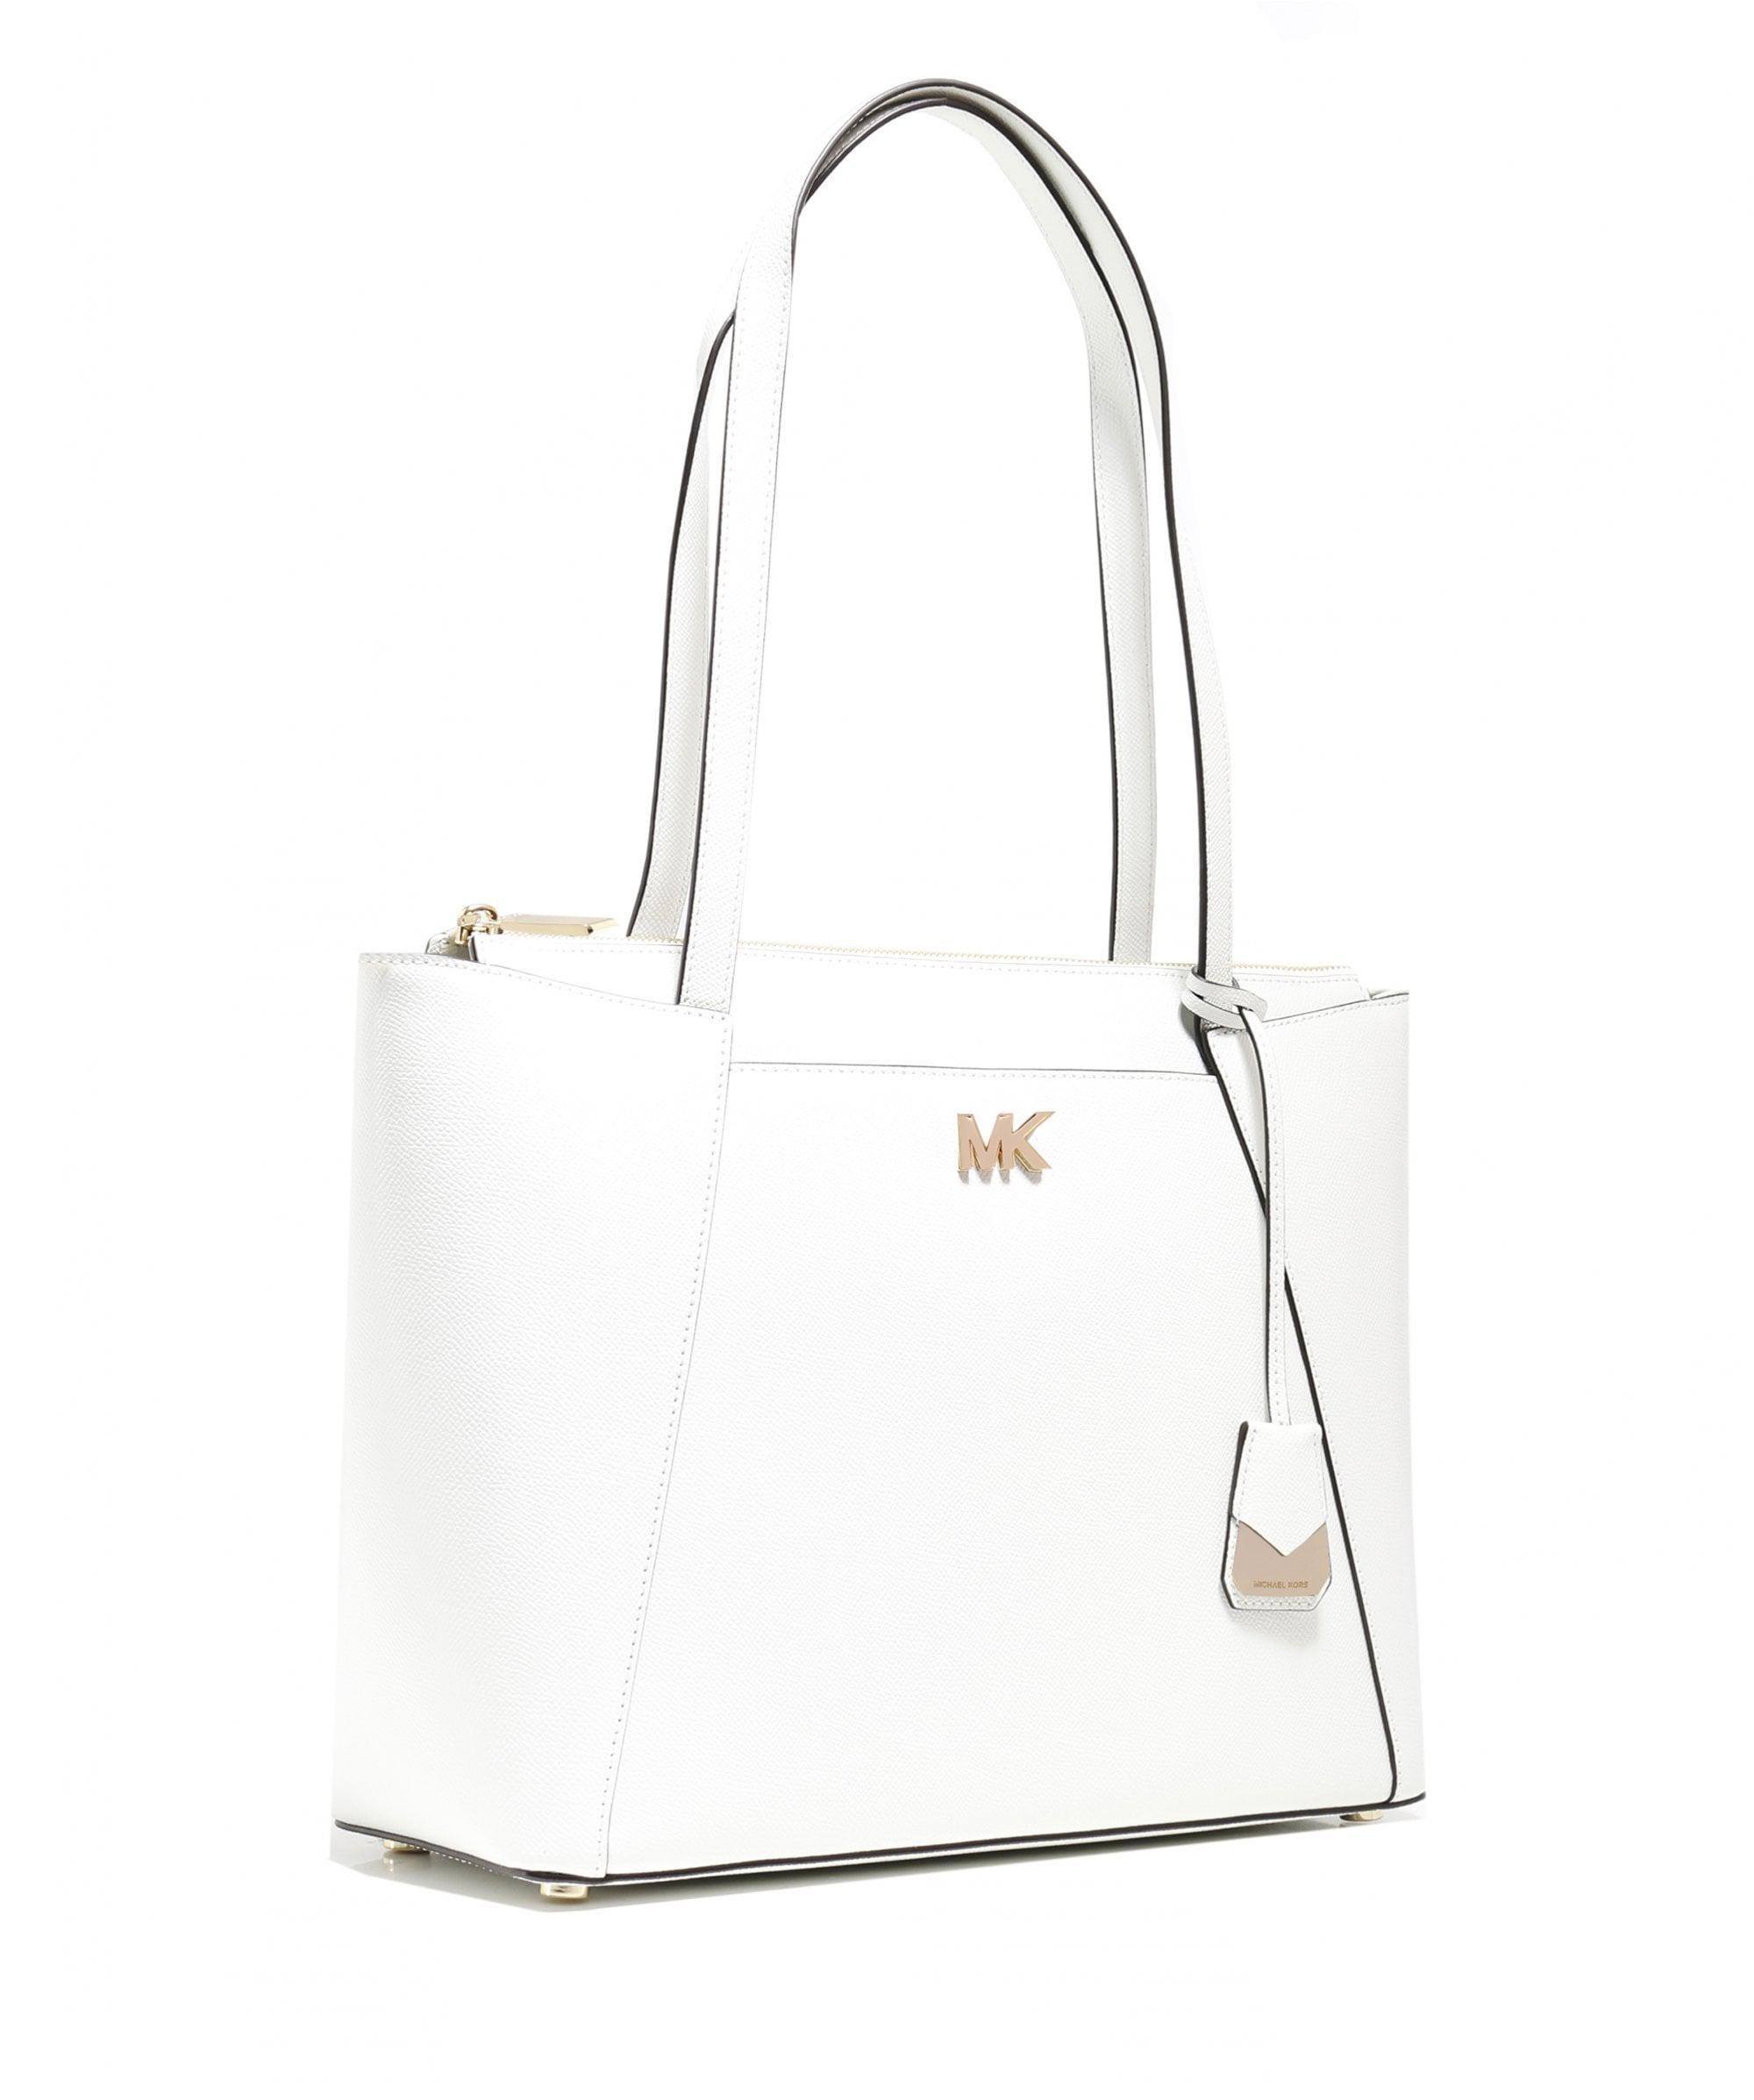 9802c54bc230 MICHAEL Michael Kors Maddie Medium Leather Tote Bag in White - Lyst